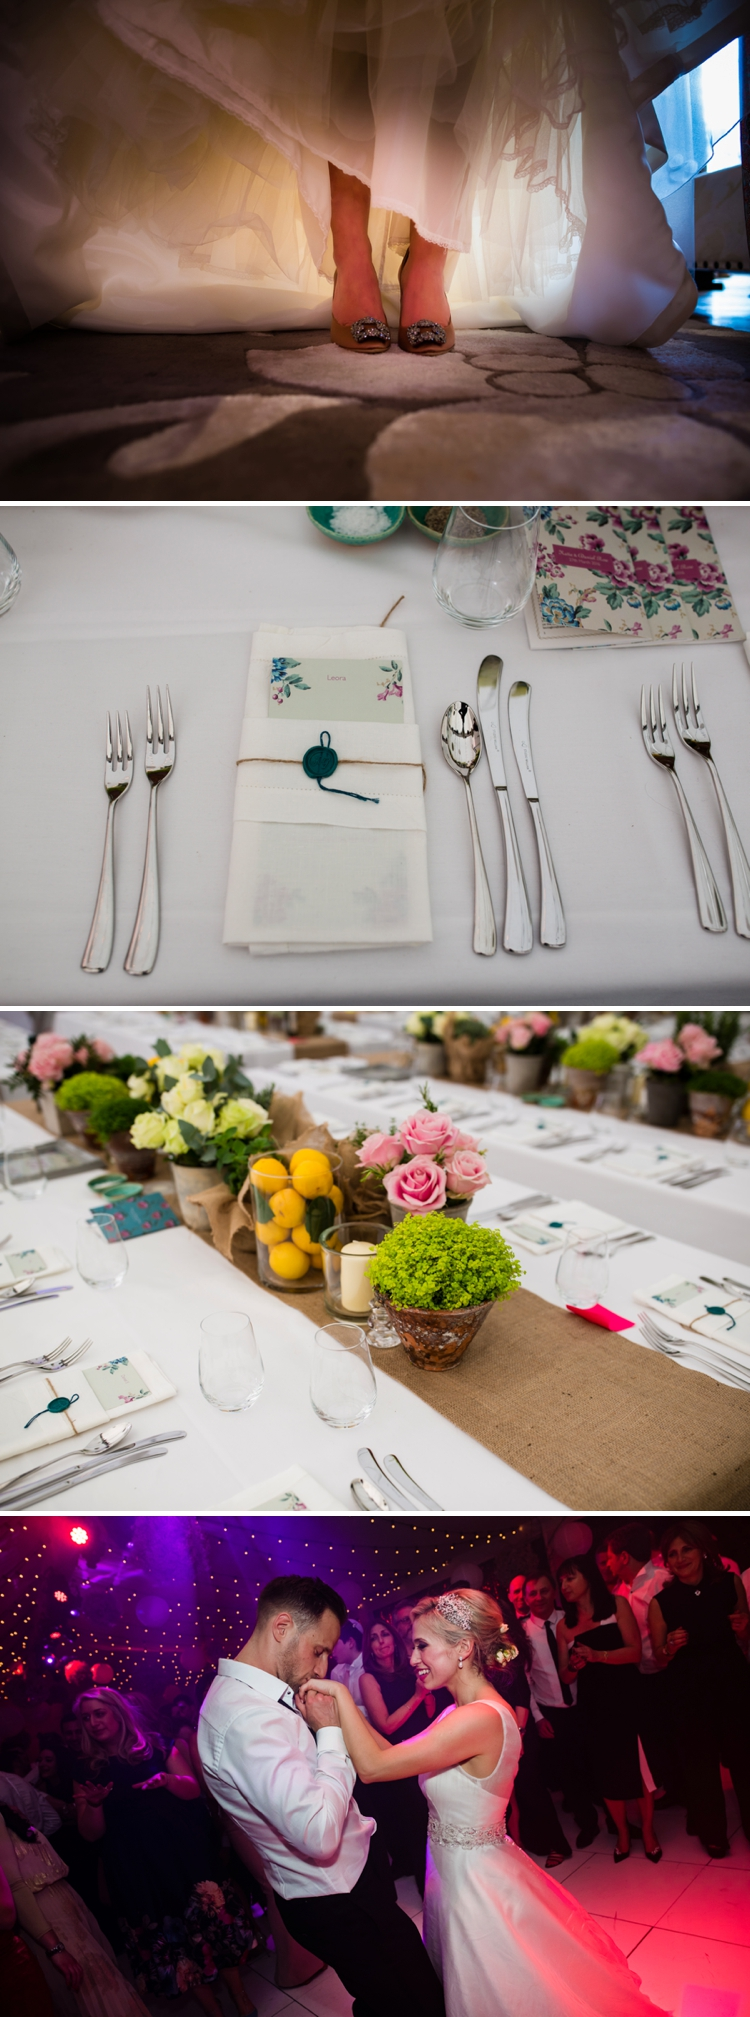 italian-themed-jewish-wedding-at-home-in-london_1